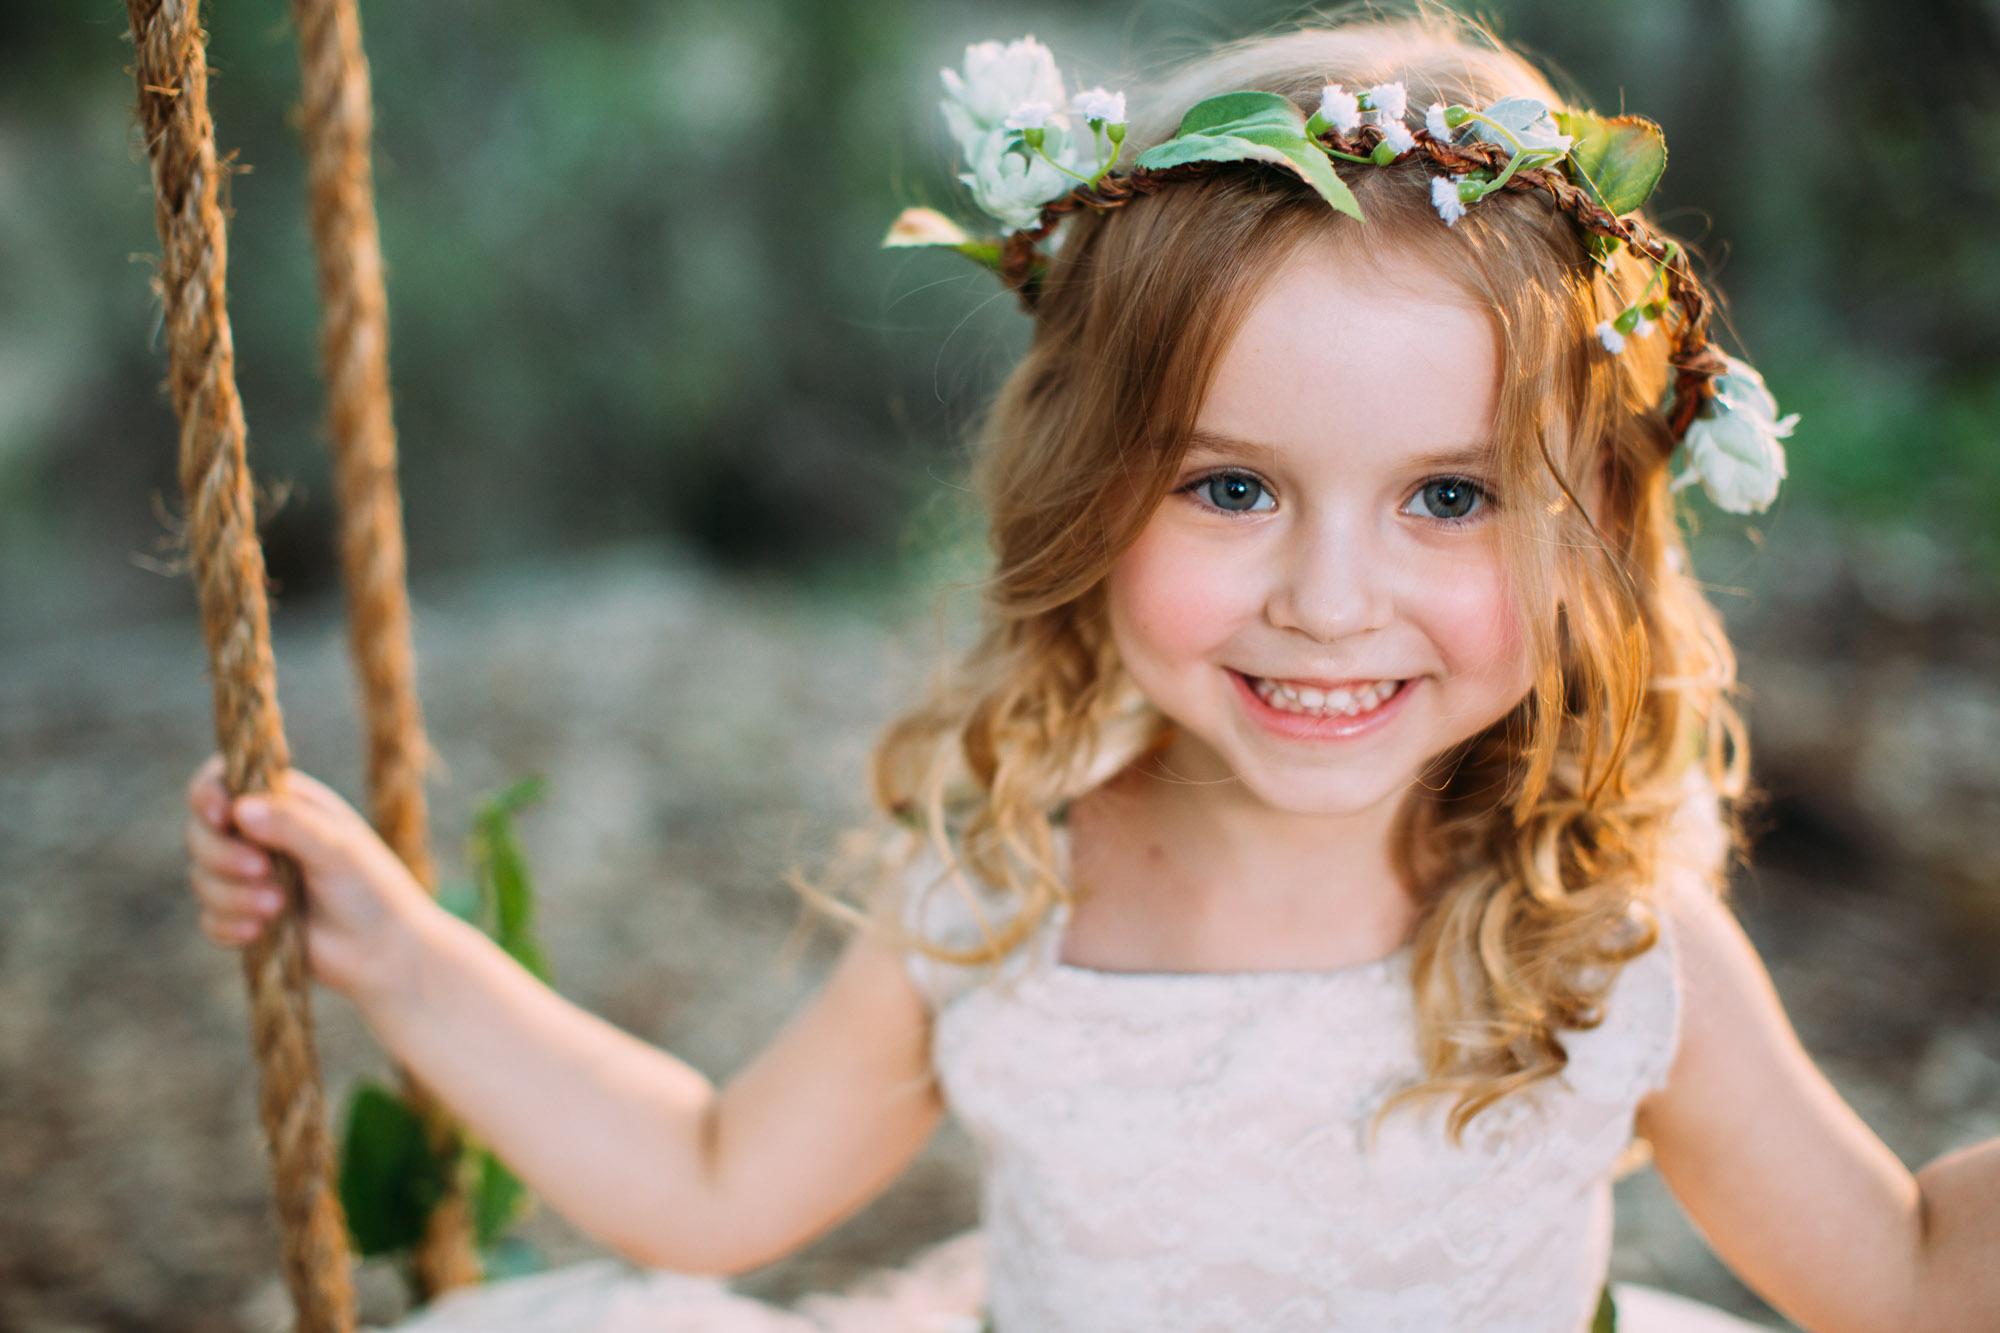 54_NK_Cera_Mack_Orange_County_Fairytale_Family_Kids_Photography_.jpg